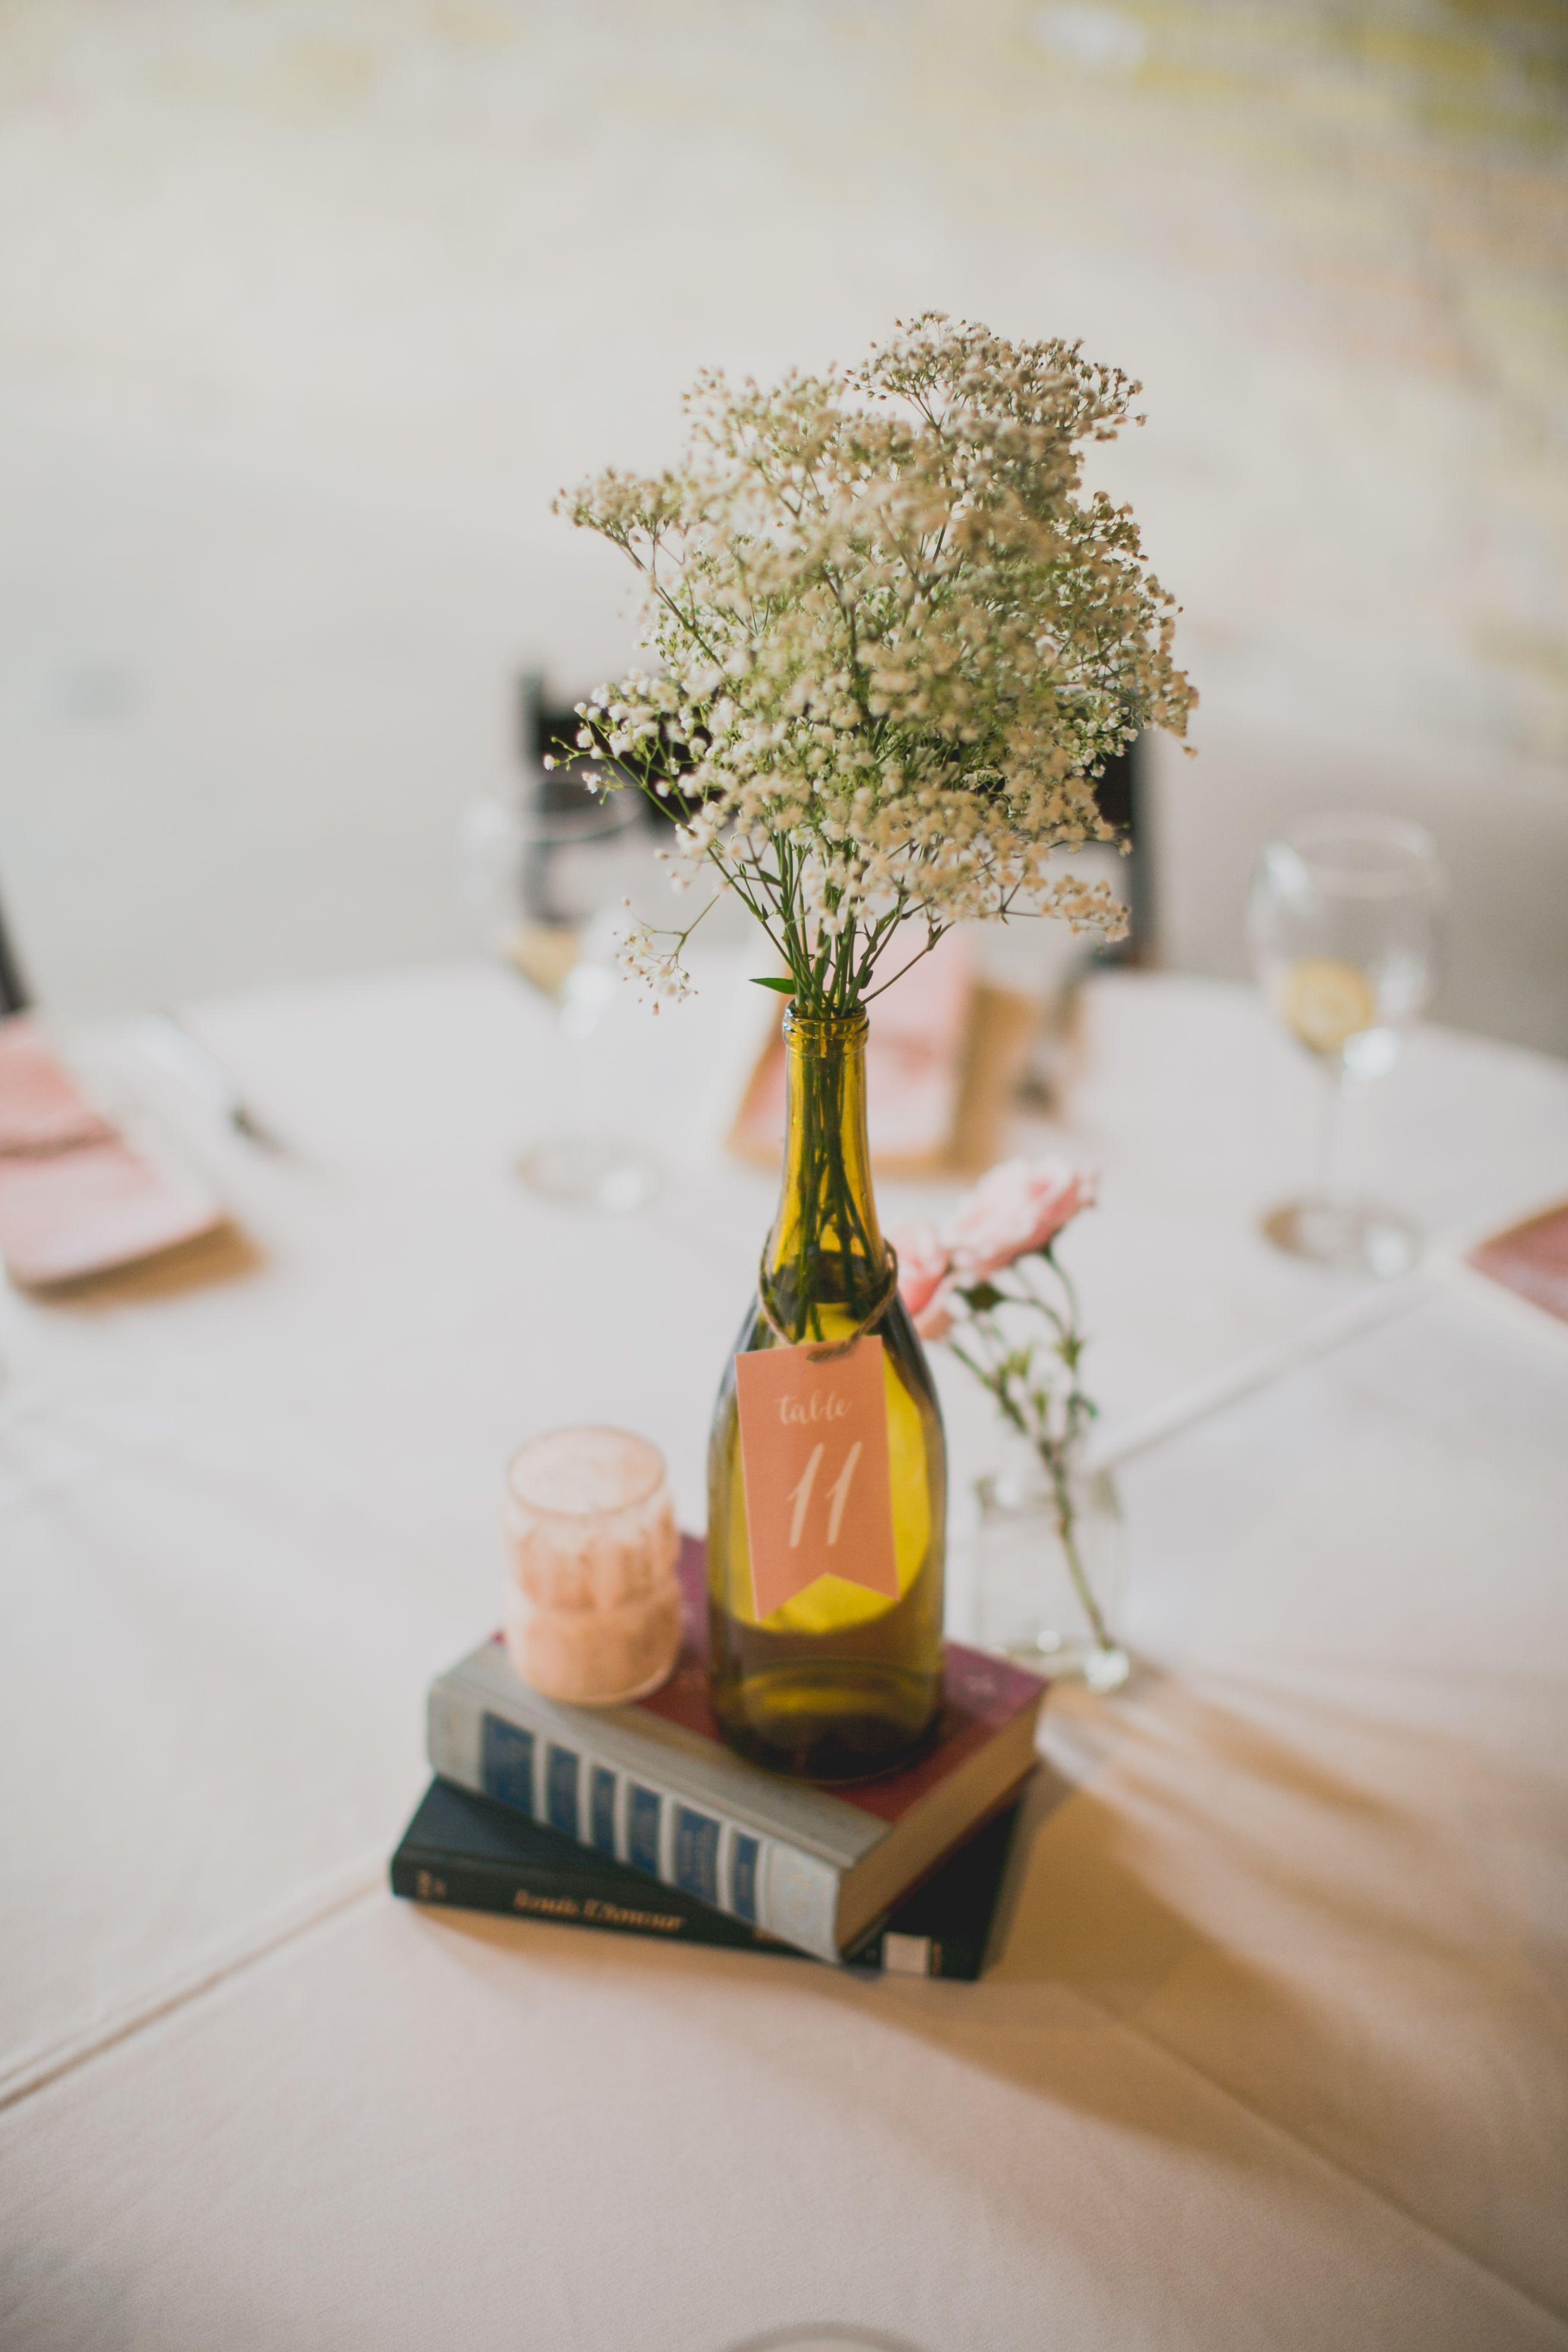 DIY Wedding Centerpiece #DIY #winebottles #babysbreath #wedding ...